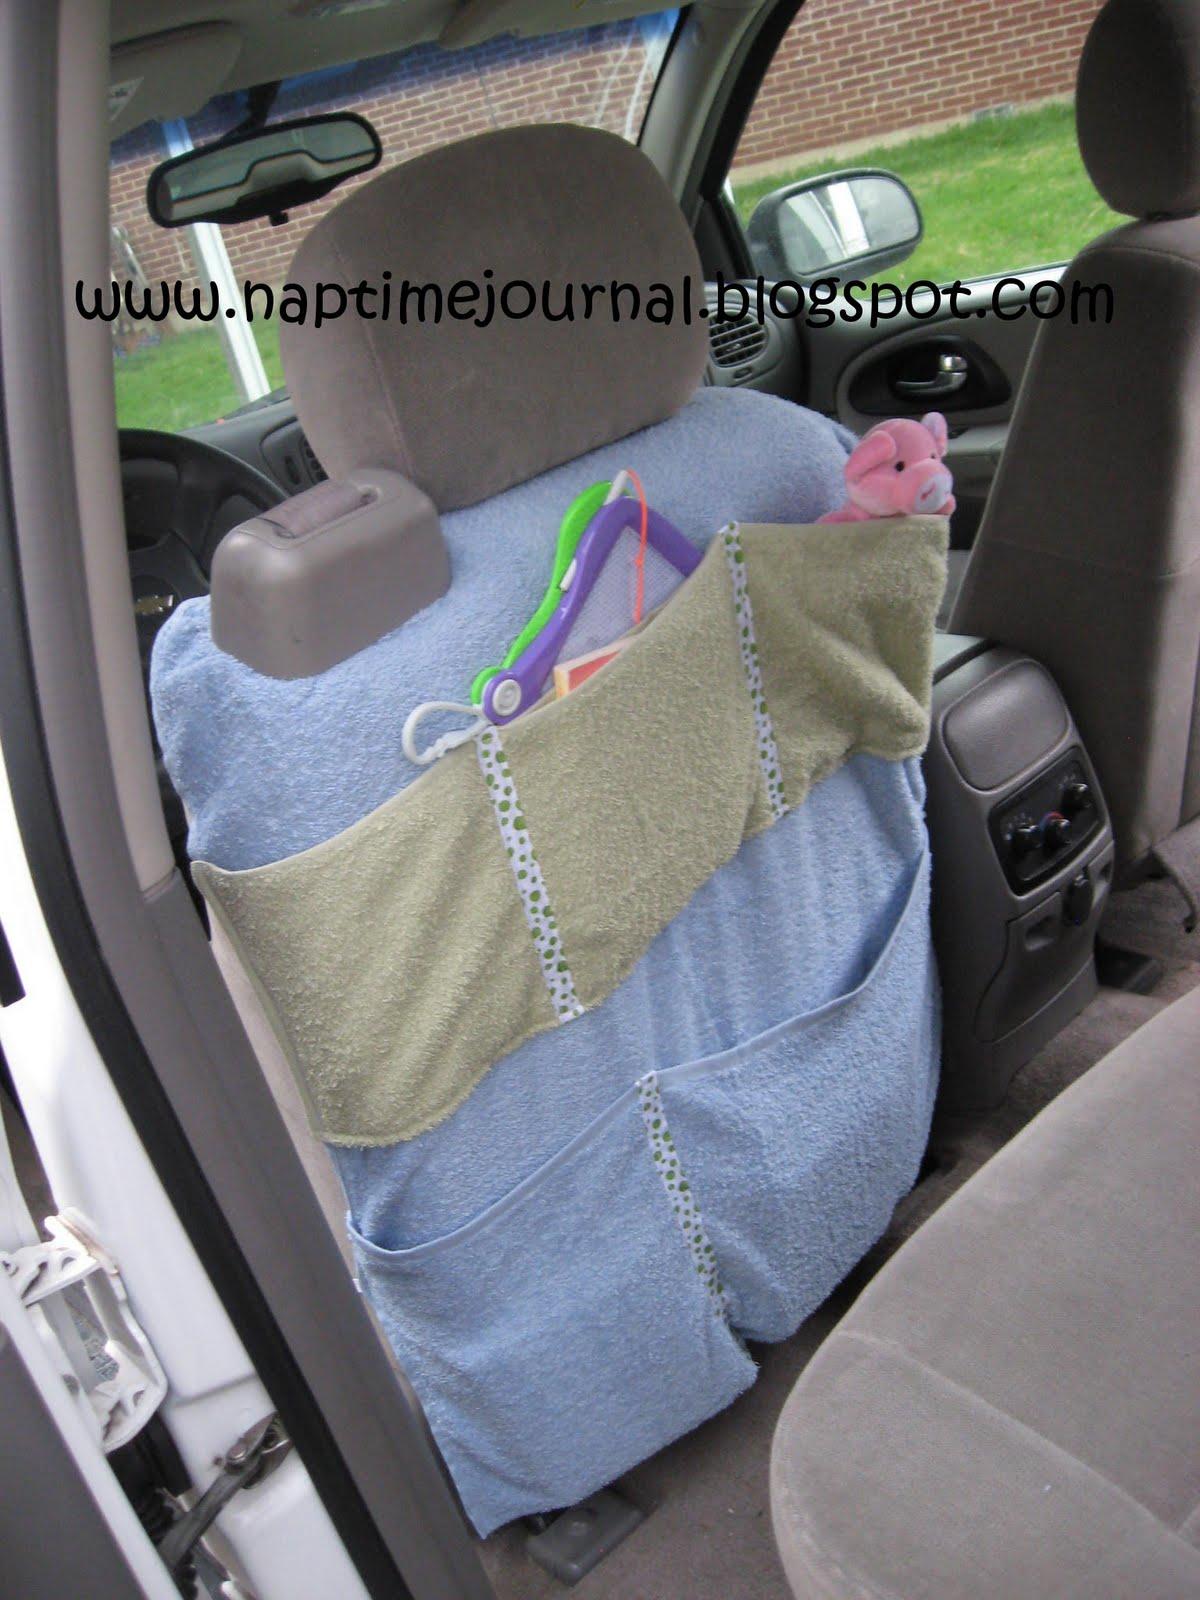 Nap Time Journal: Bathroom Towel CAR ORGANIZER